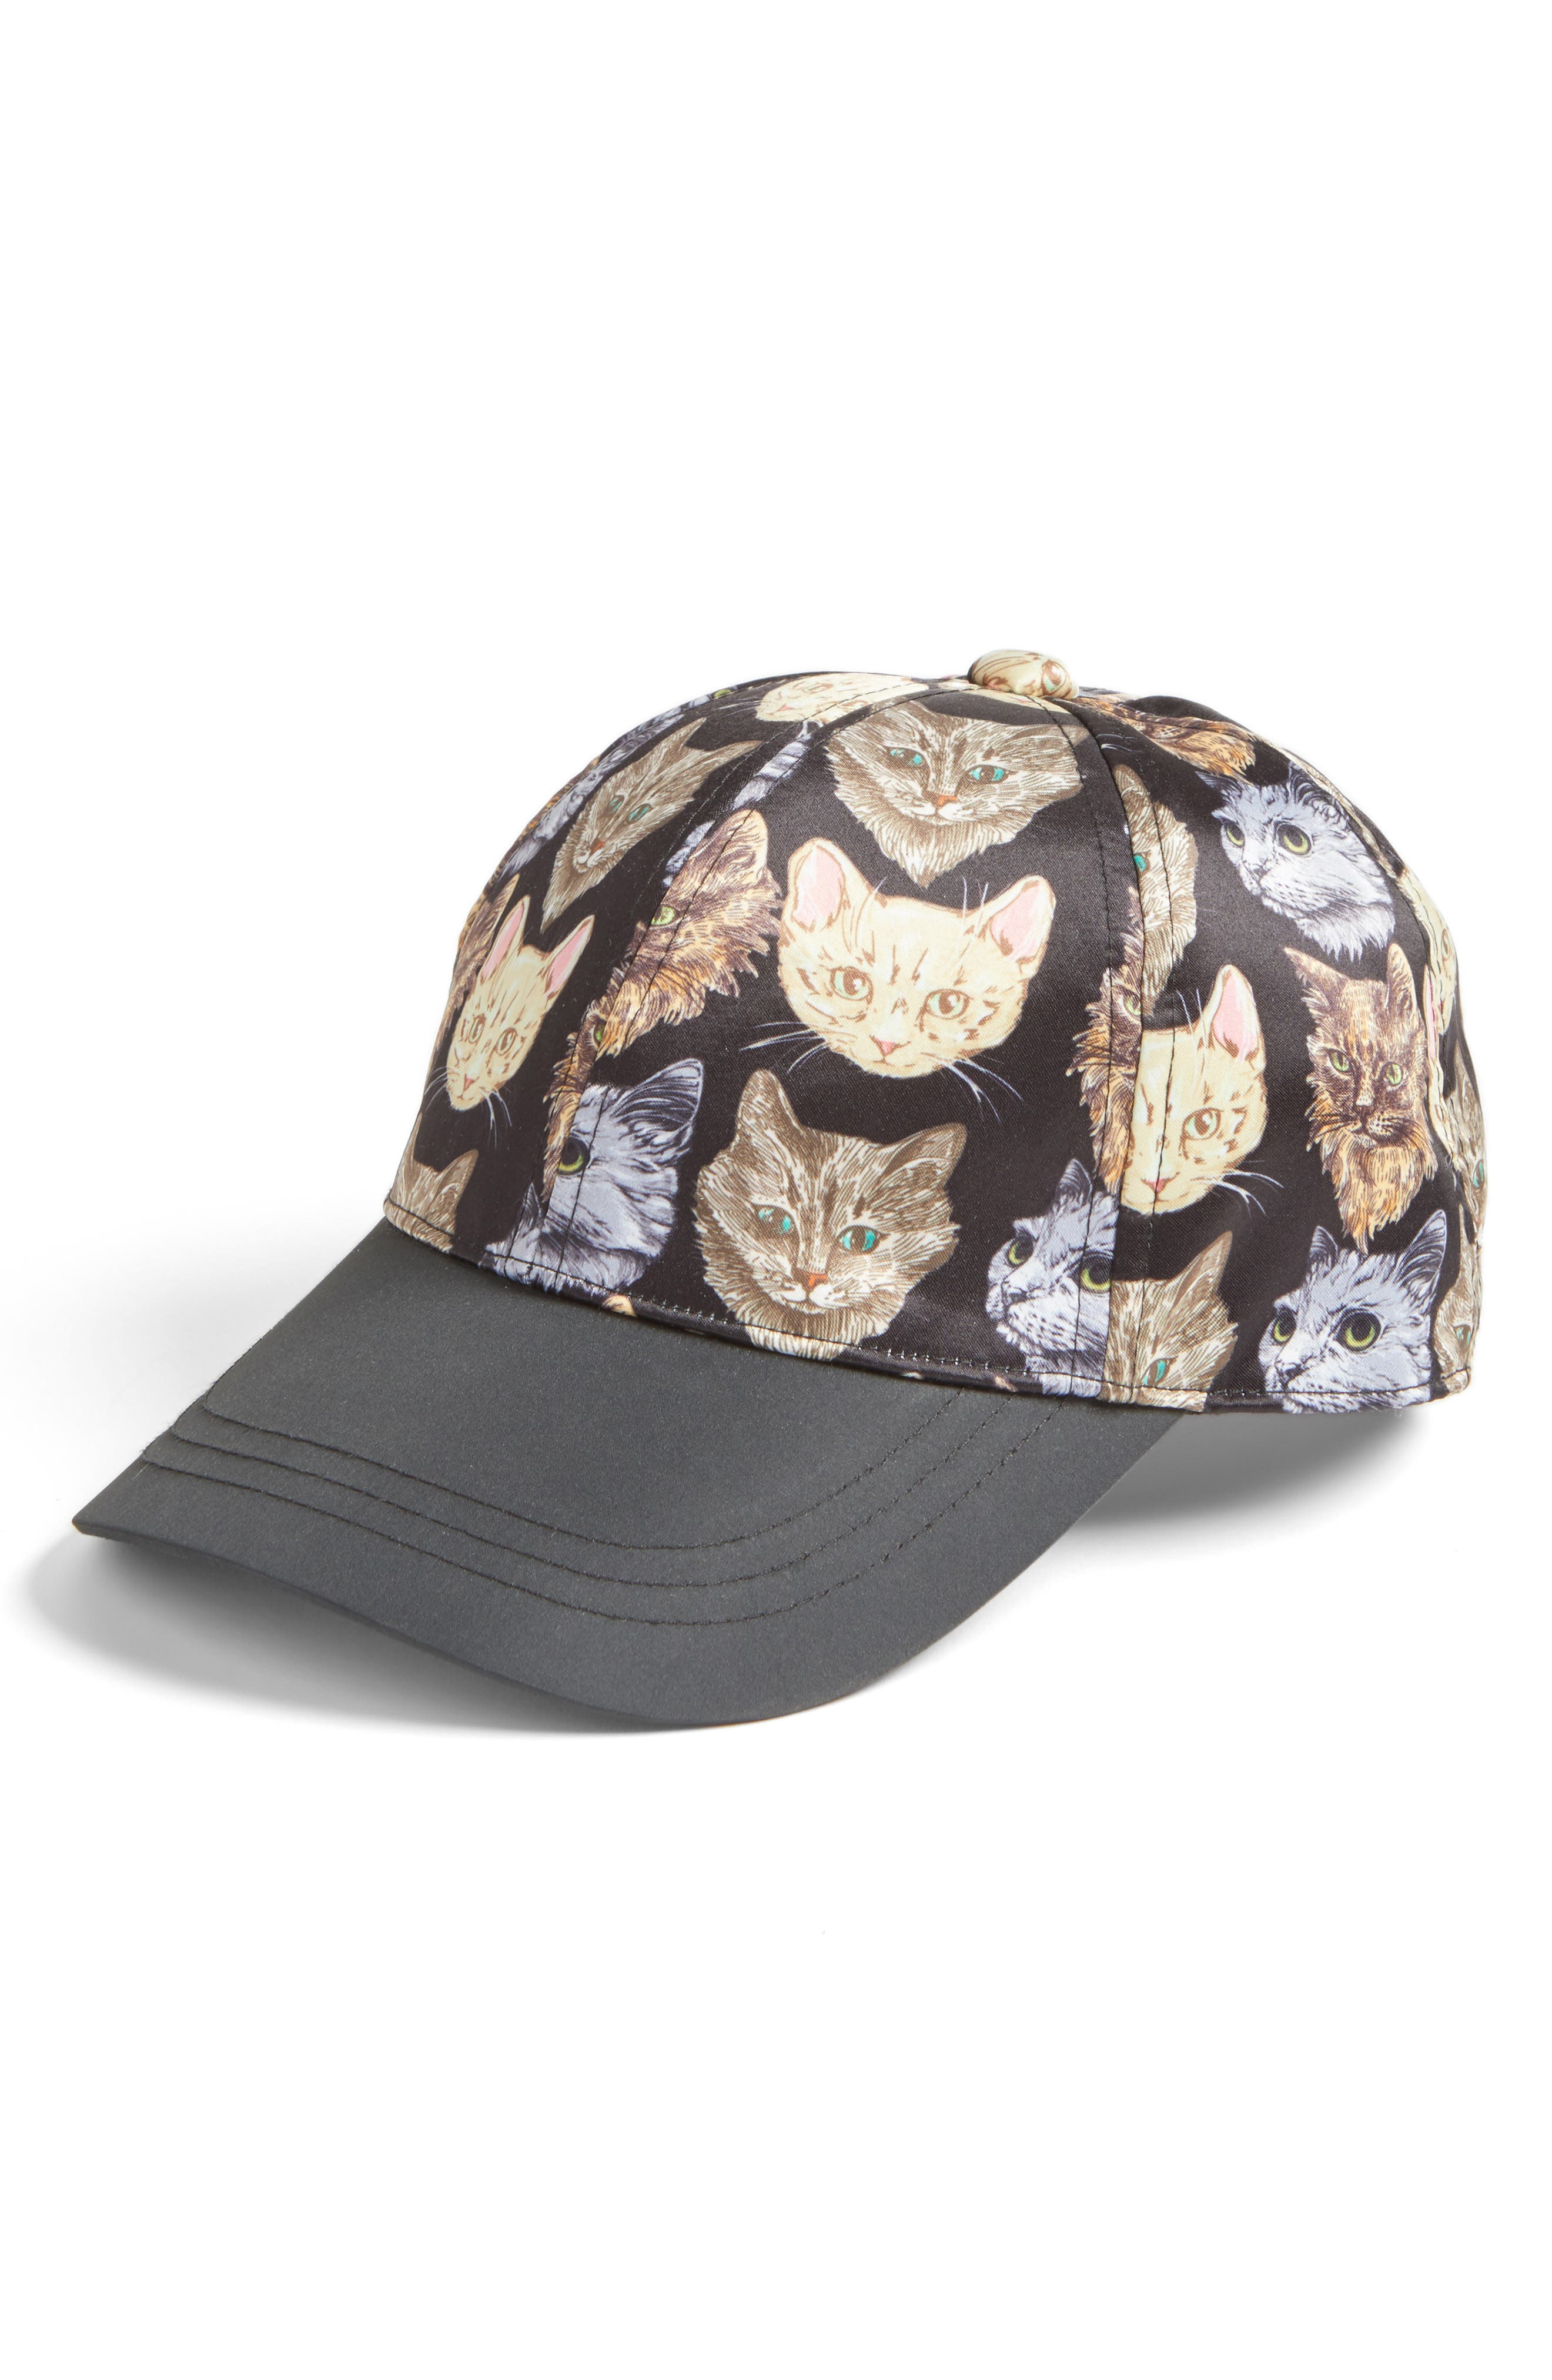 August Hat Cat Baseball Cap